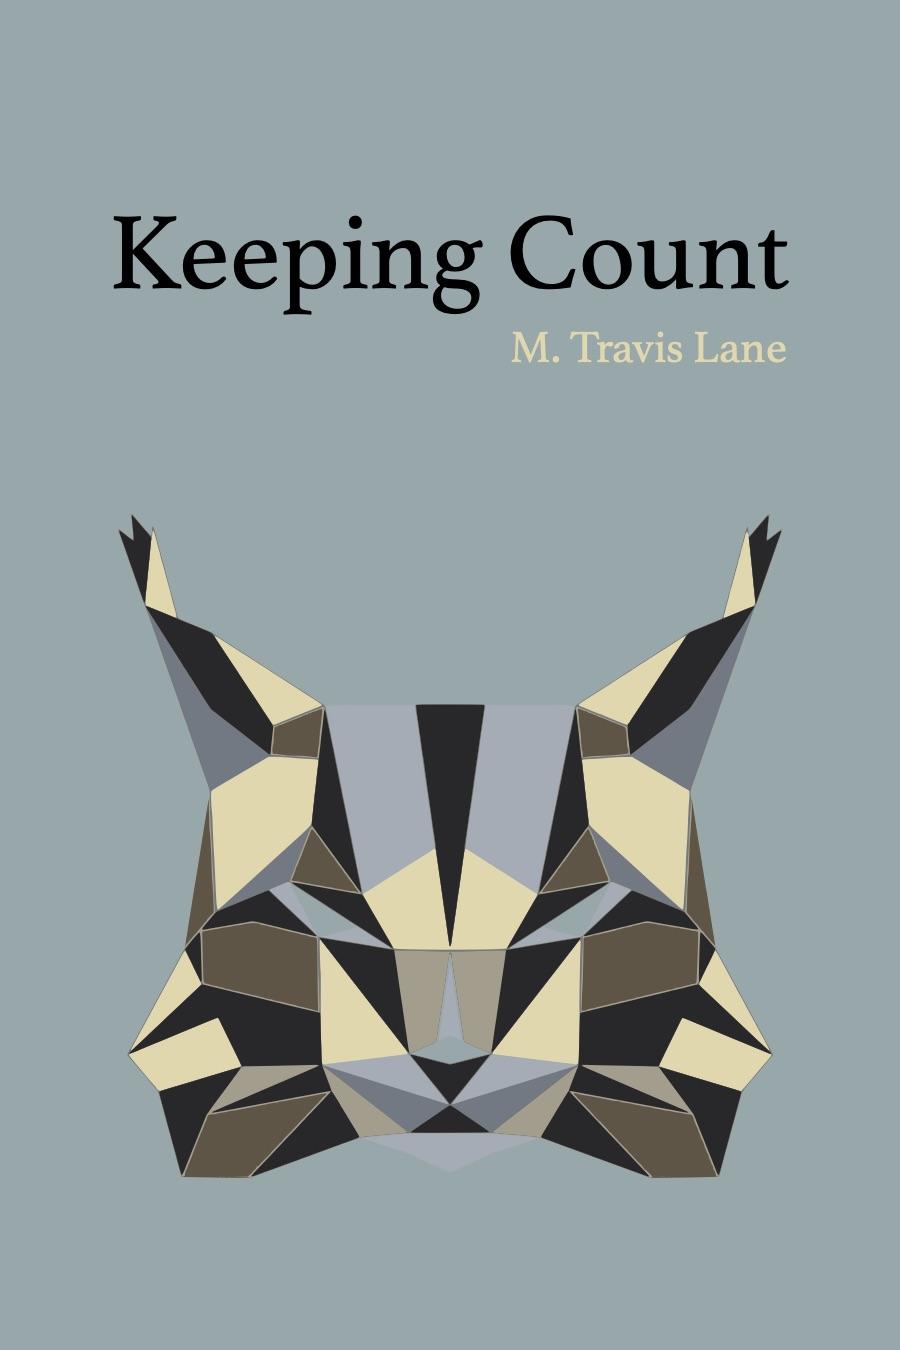 KeepingCountEbookCover